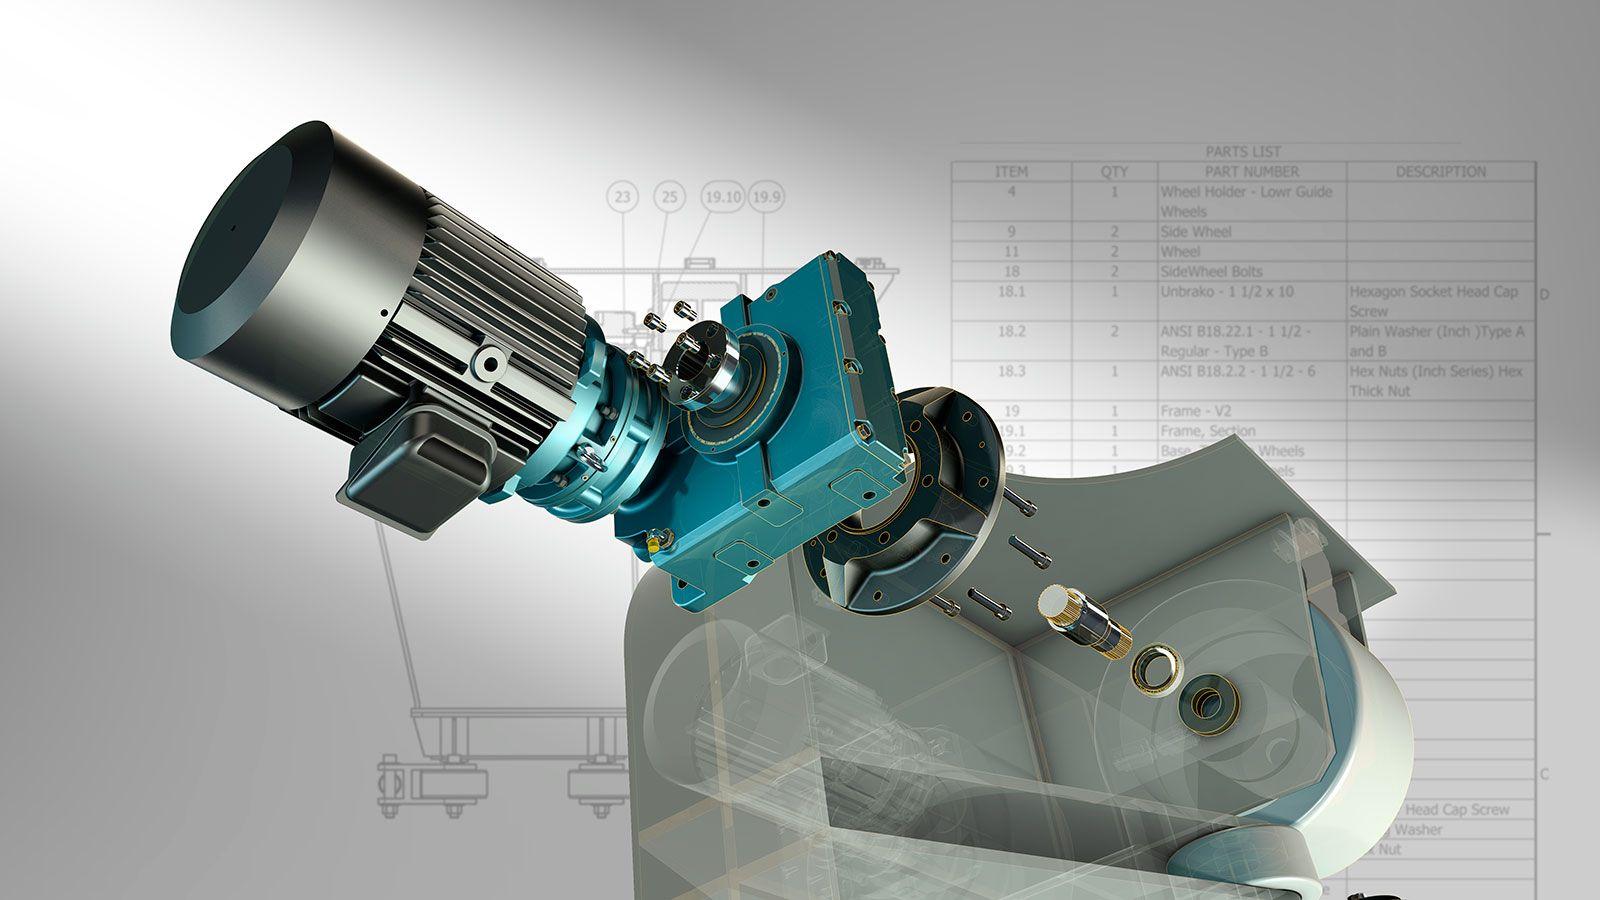 autodesck-inventor-wp3340395